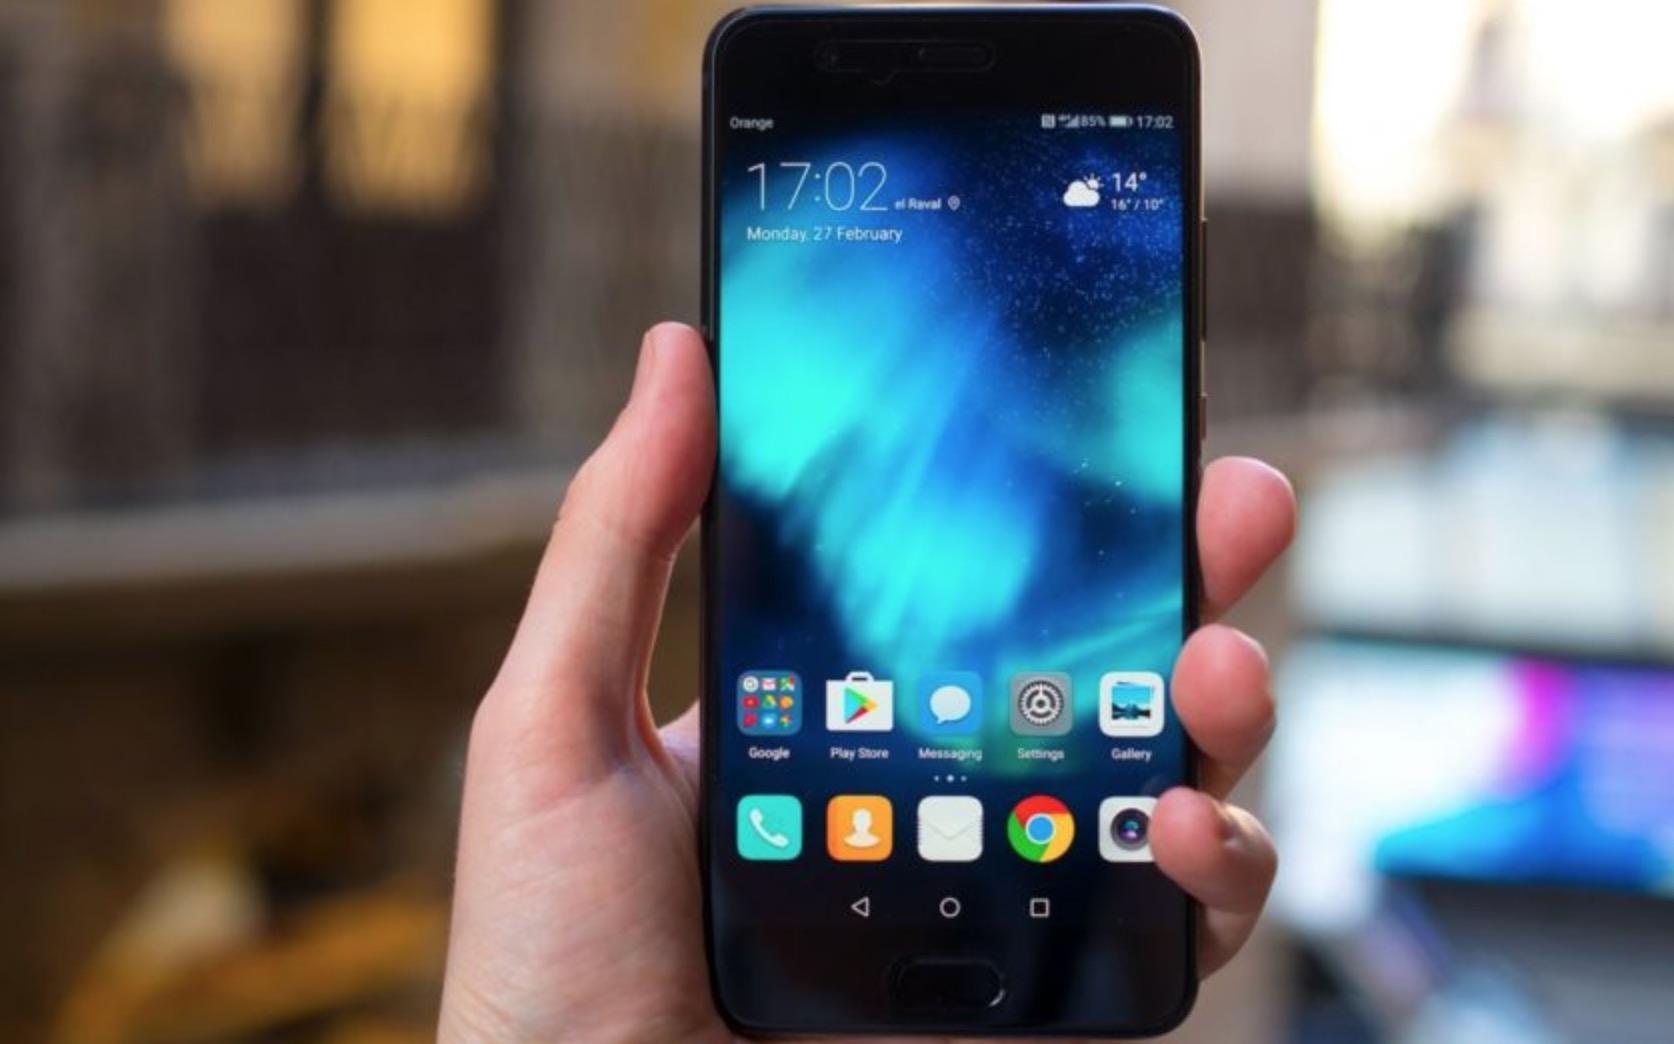 Huawei P10 Plus schermo